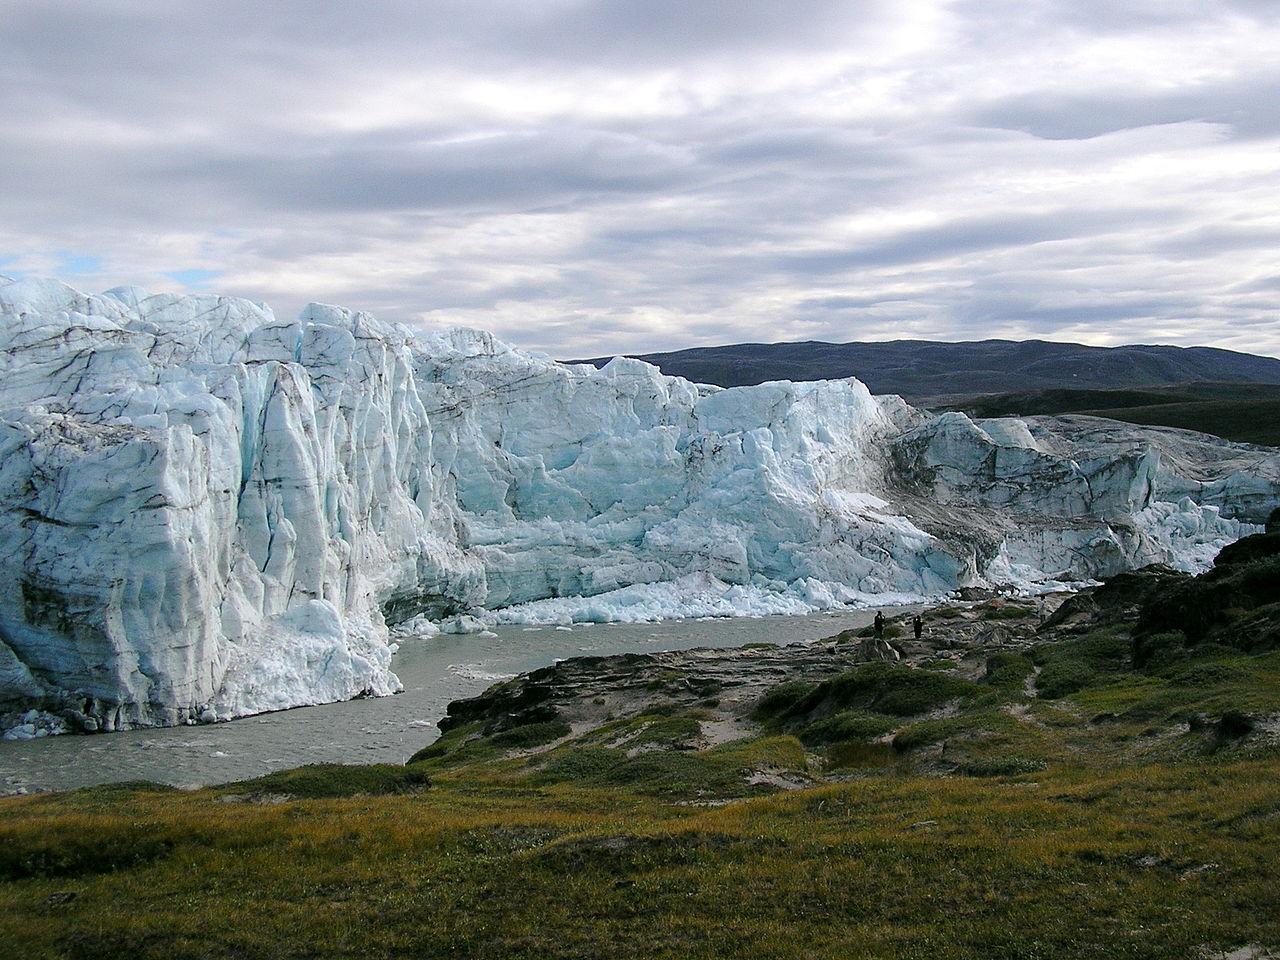 Greenland Kangerlussuaq by ChangIc wikimedia commons